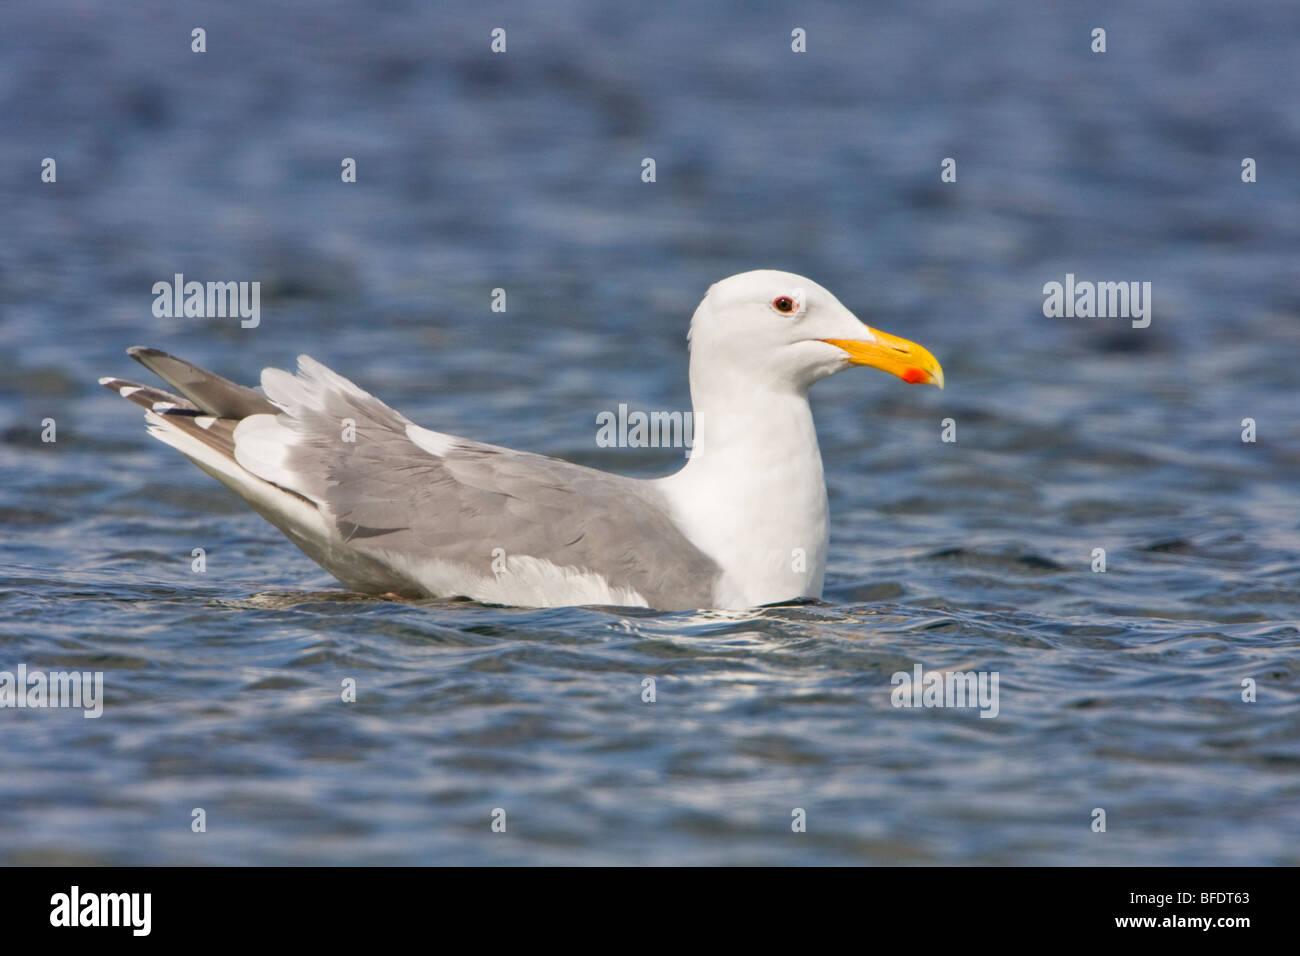 Glaucous-winged Gull (Larus glaucescens) swimming in Victoria, Vancouver Island, British Columbia, Canada - Stock Image